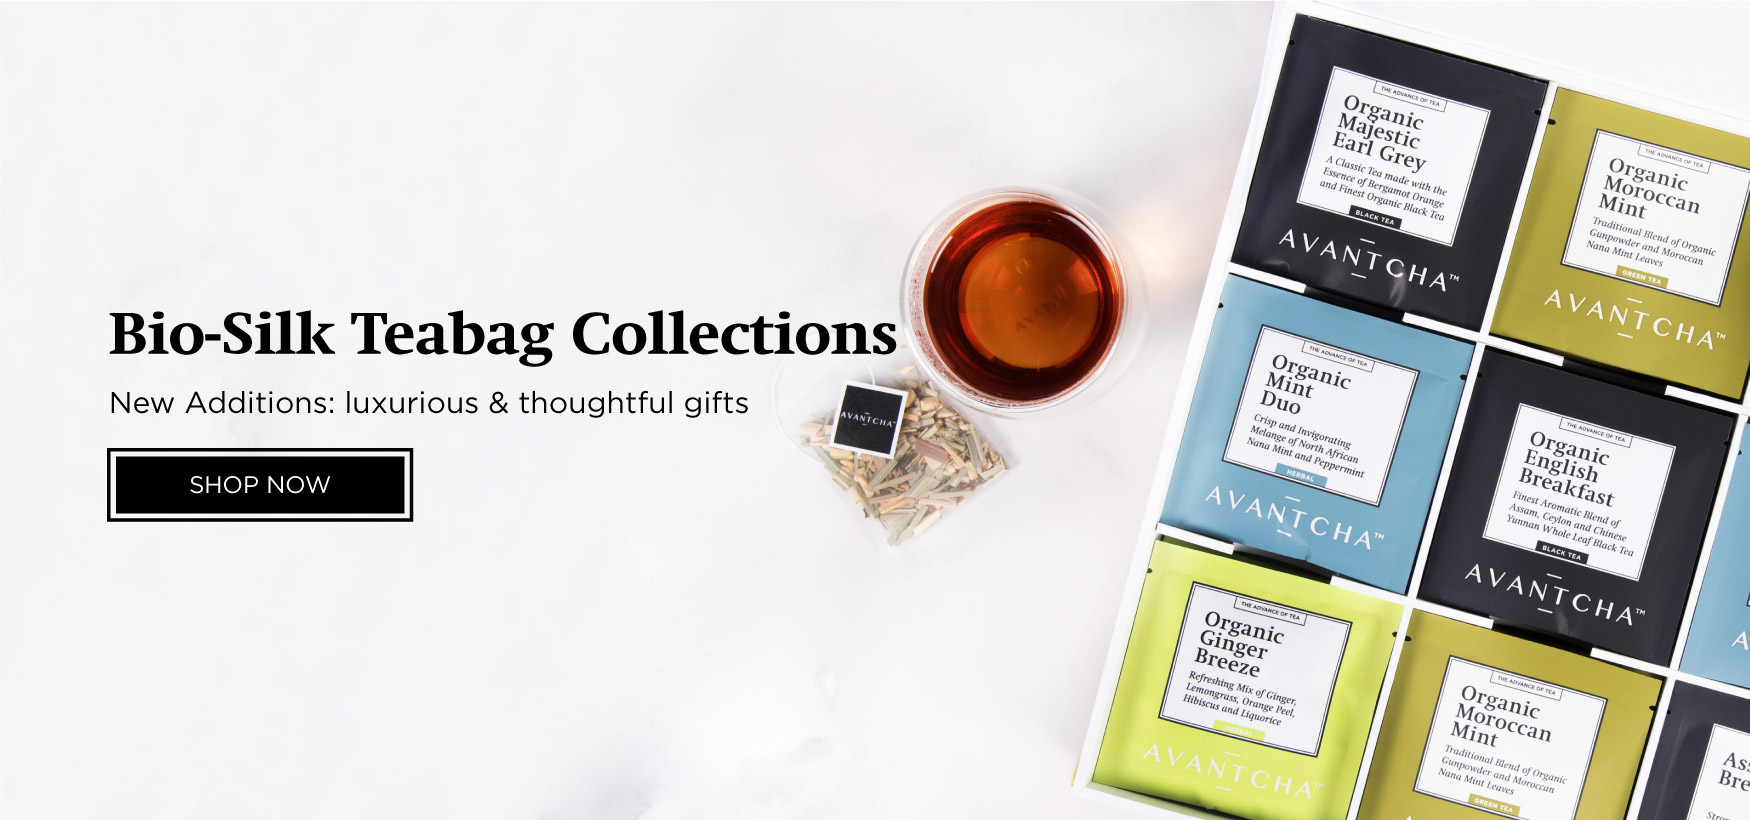 Bio-Silk Teabag Collection